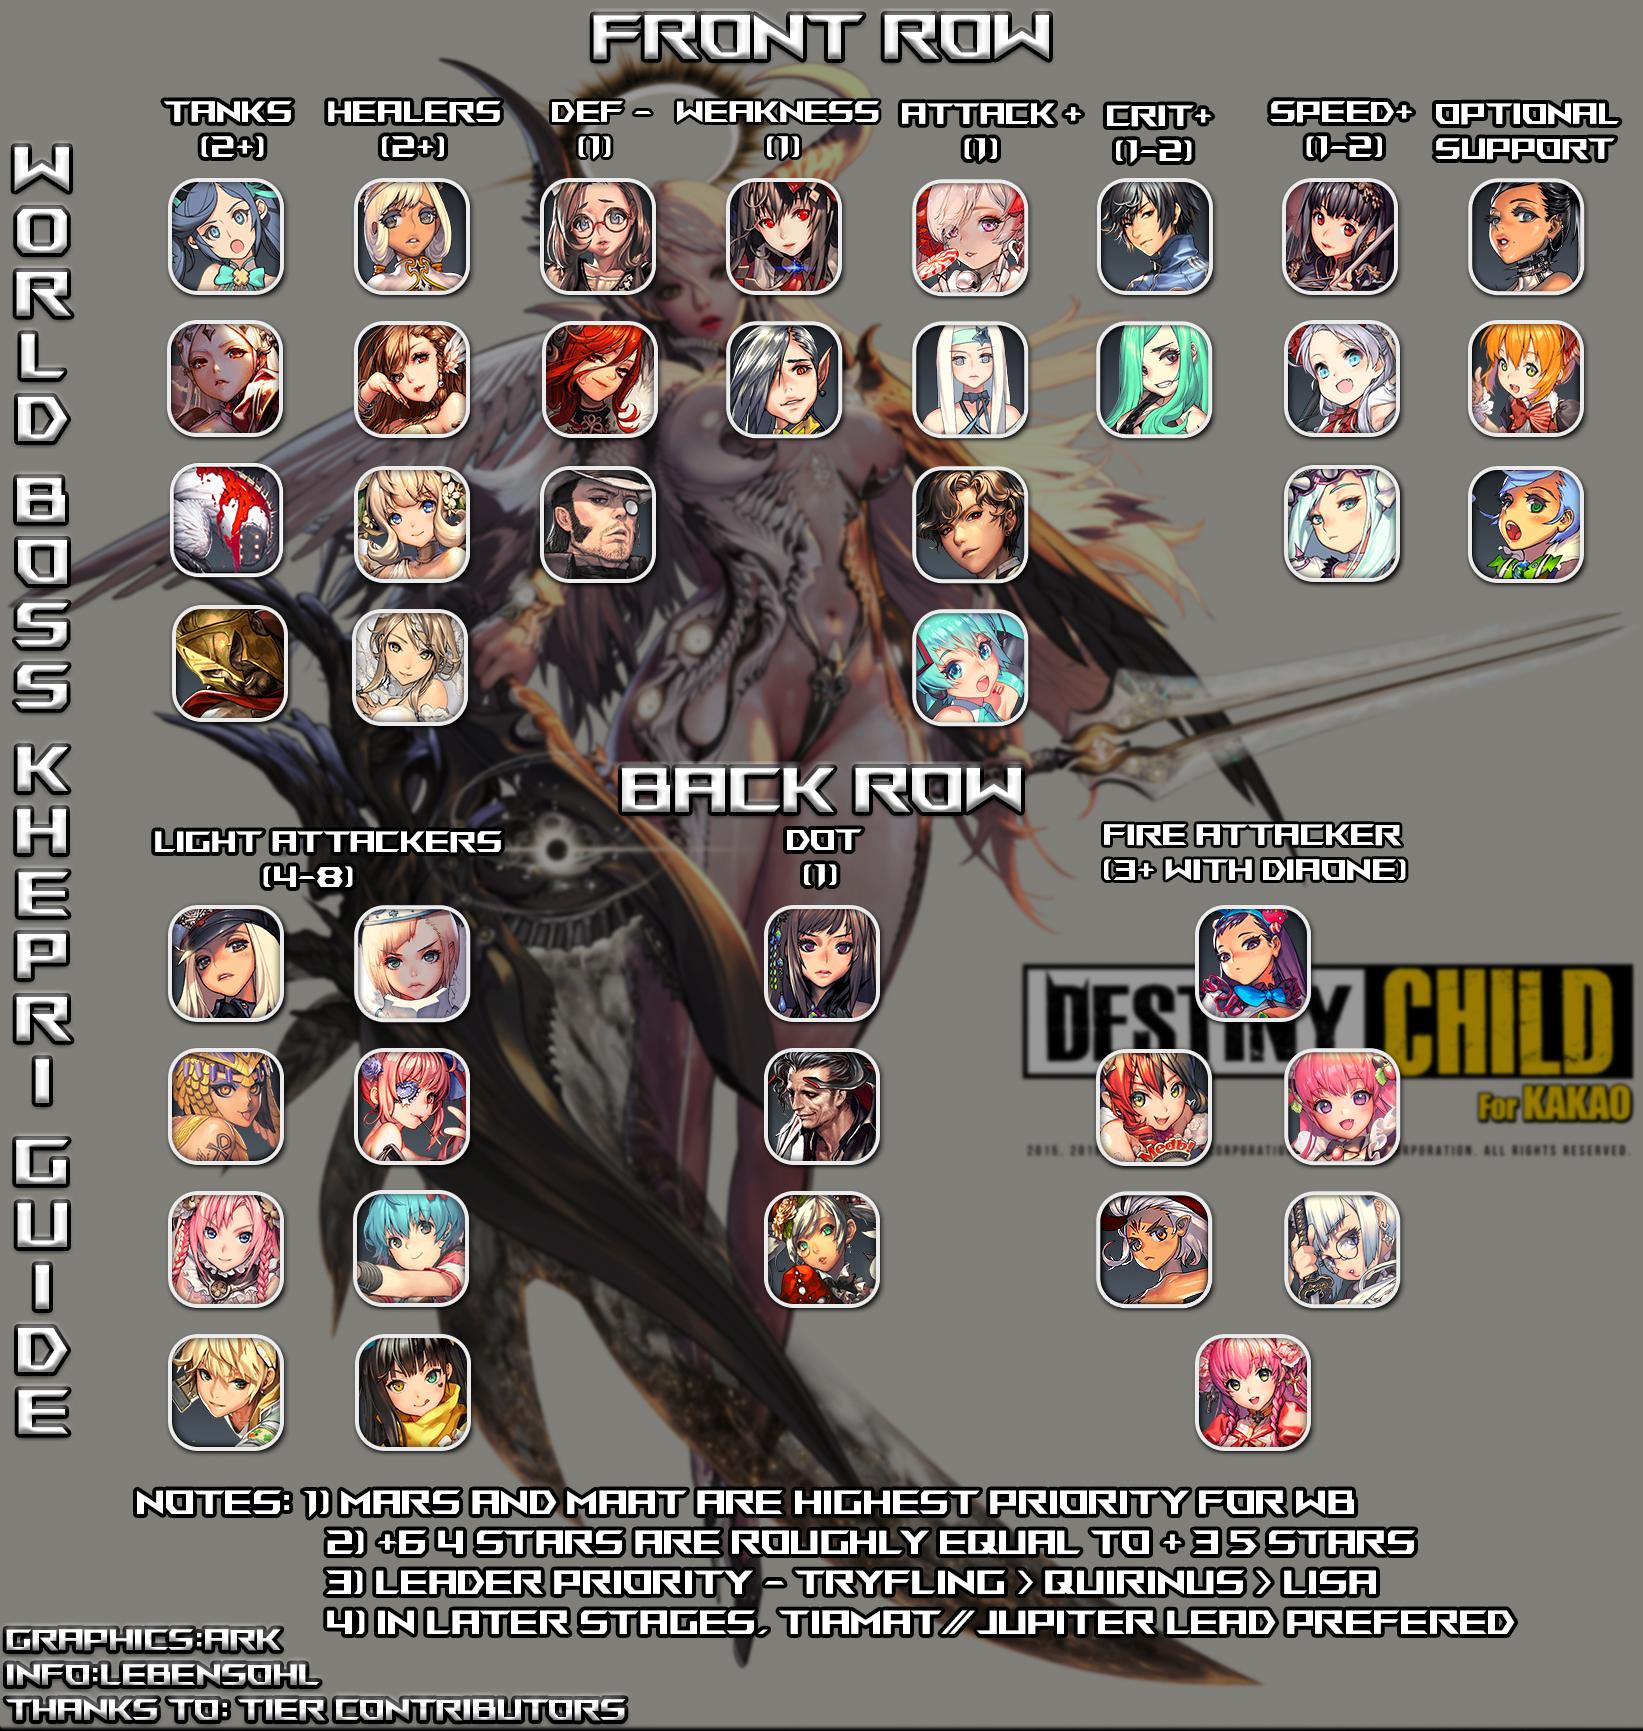 Destiny Child Mobile Game - English Database Info